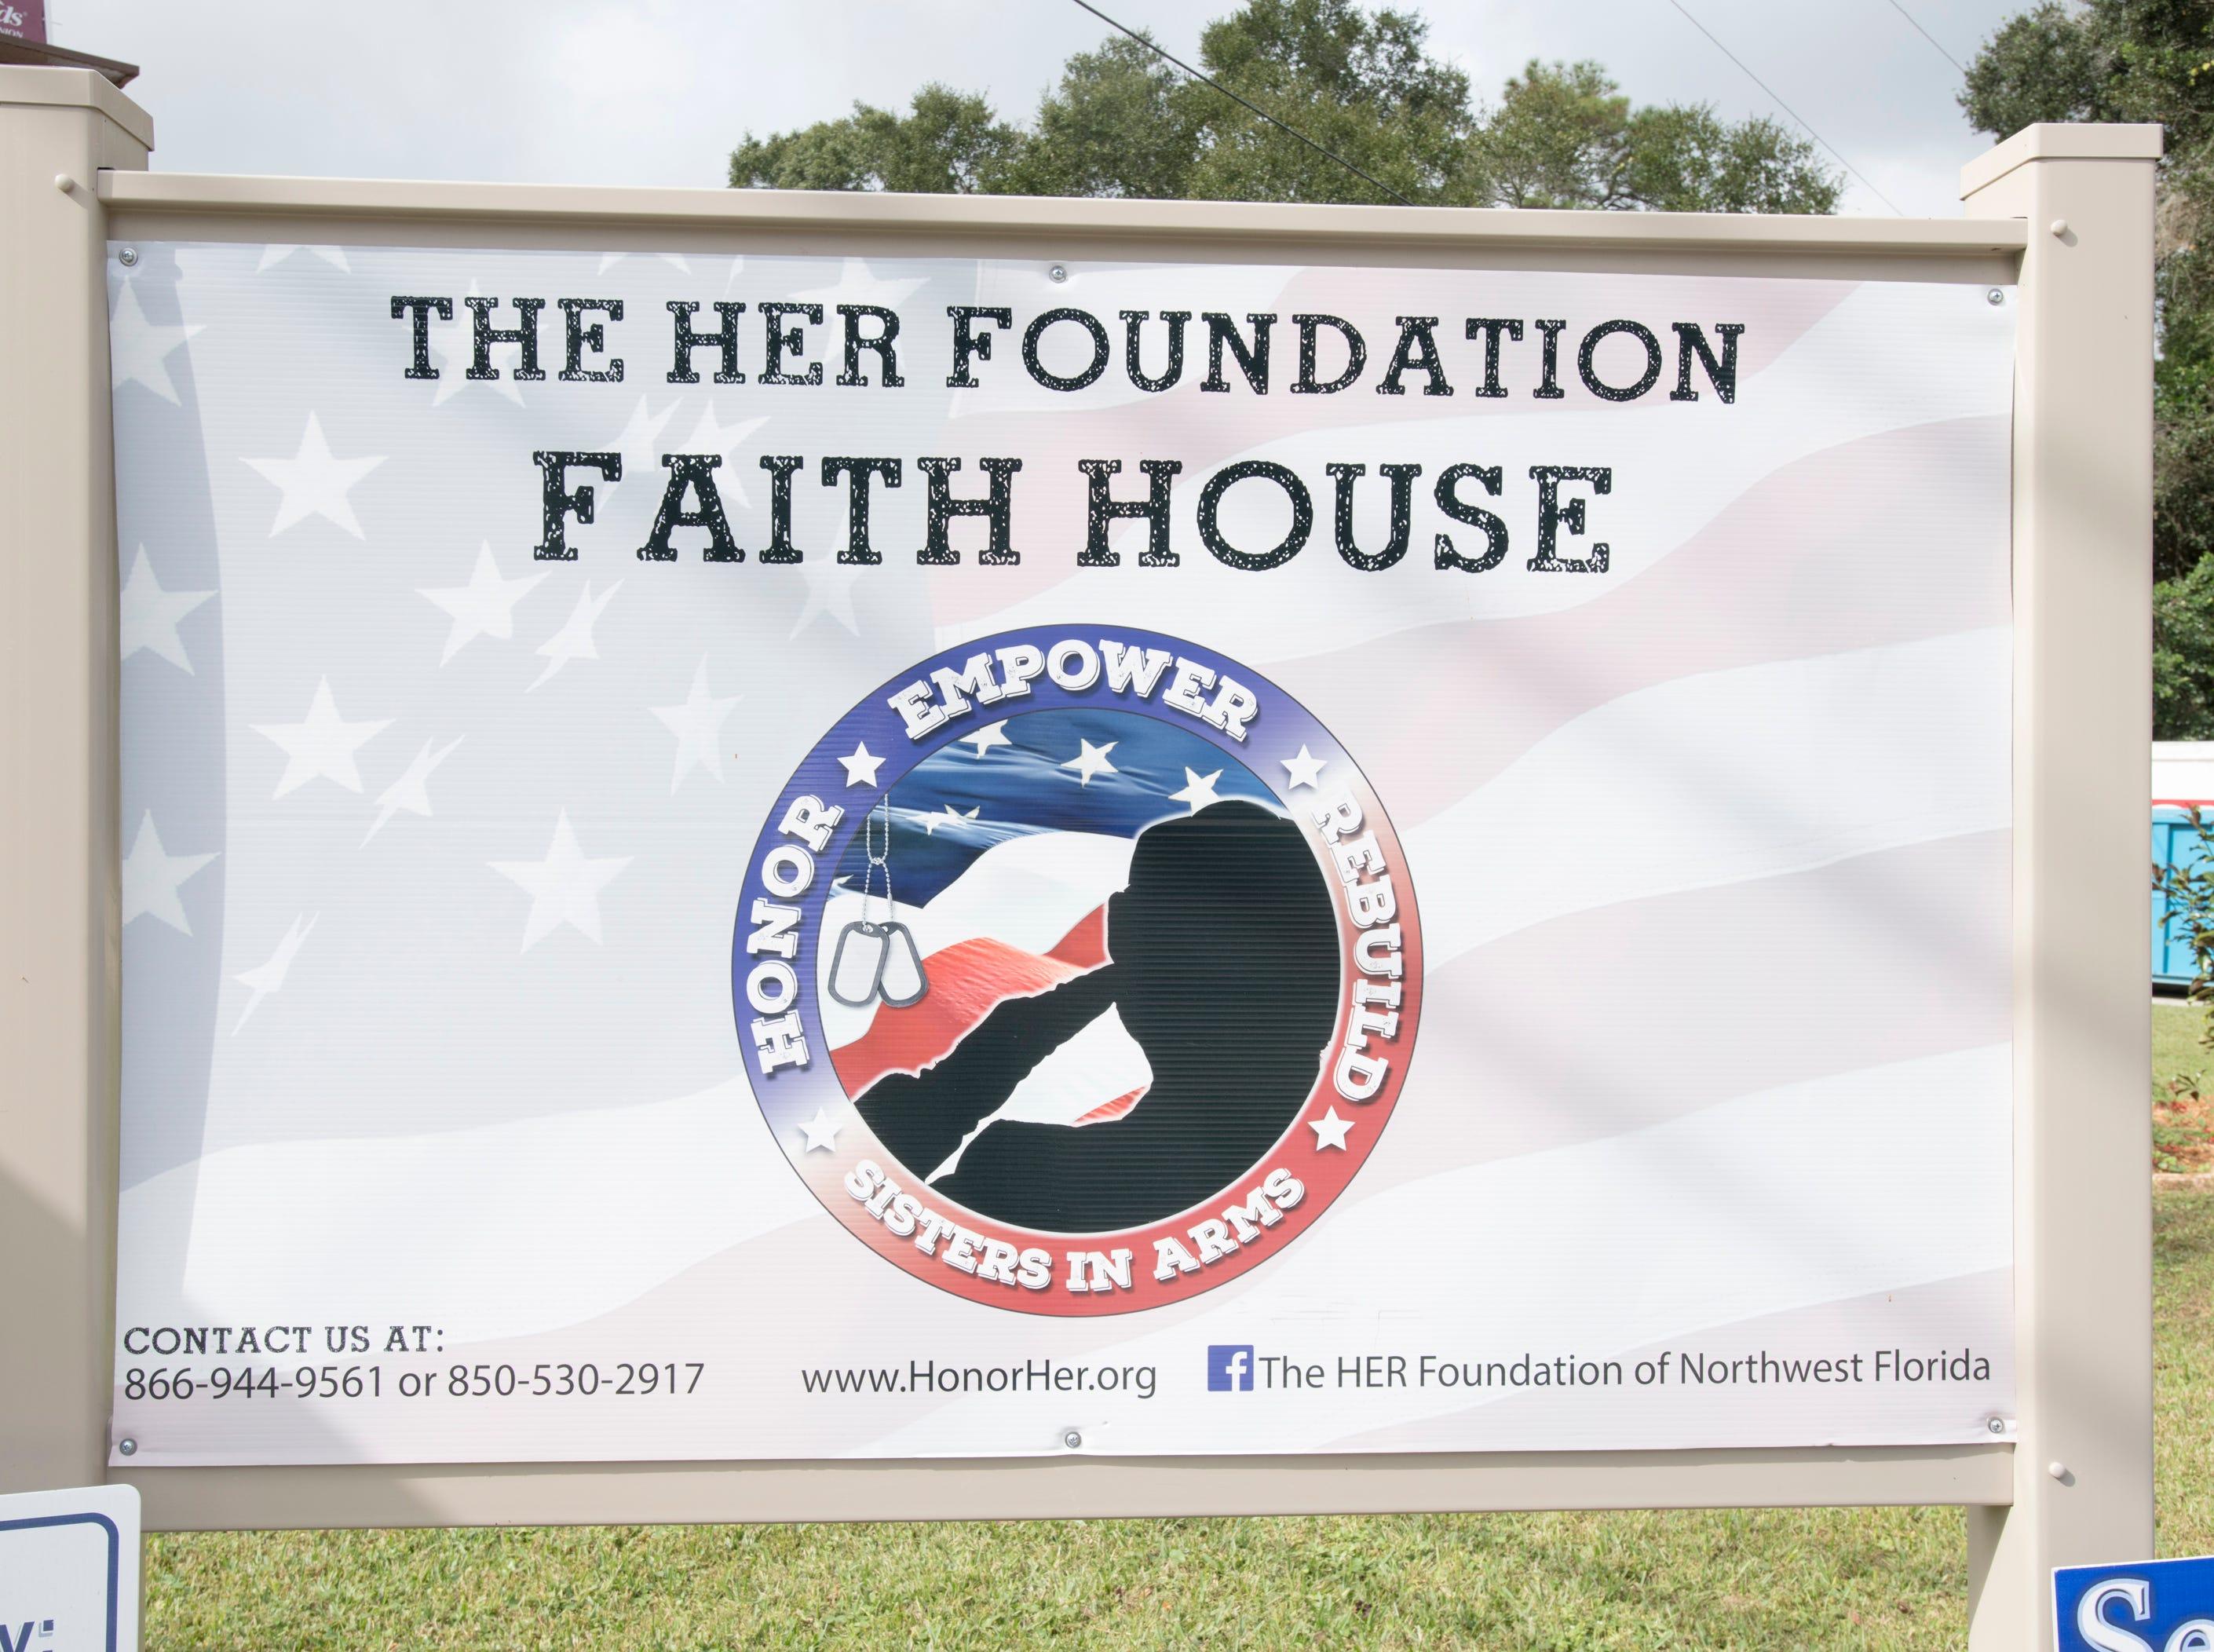 HER Foundation Faith House on West Fairfield Drive in Pensacola on Wednesday, November 7, 2018.